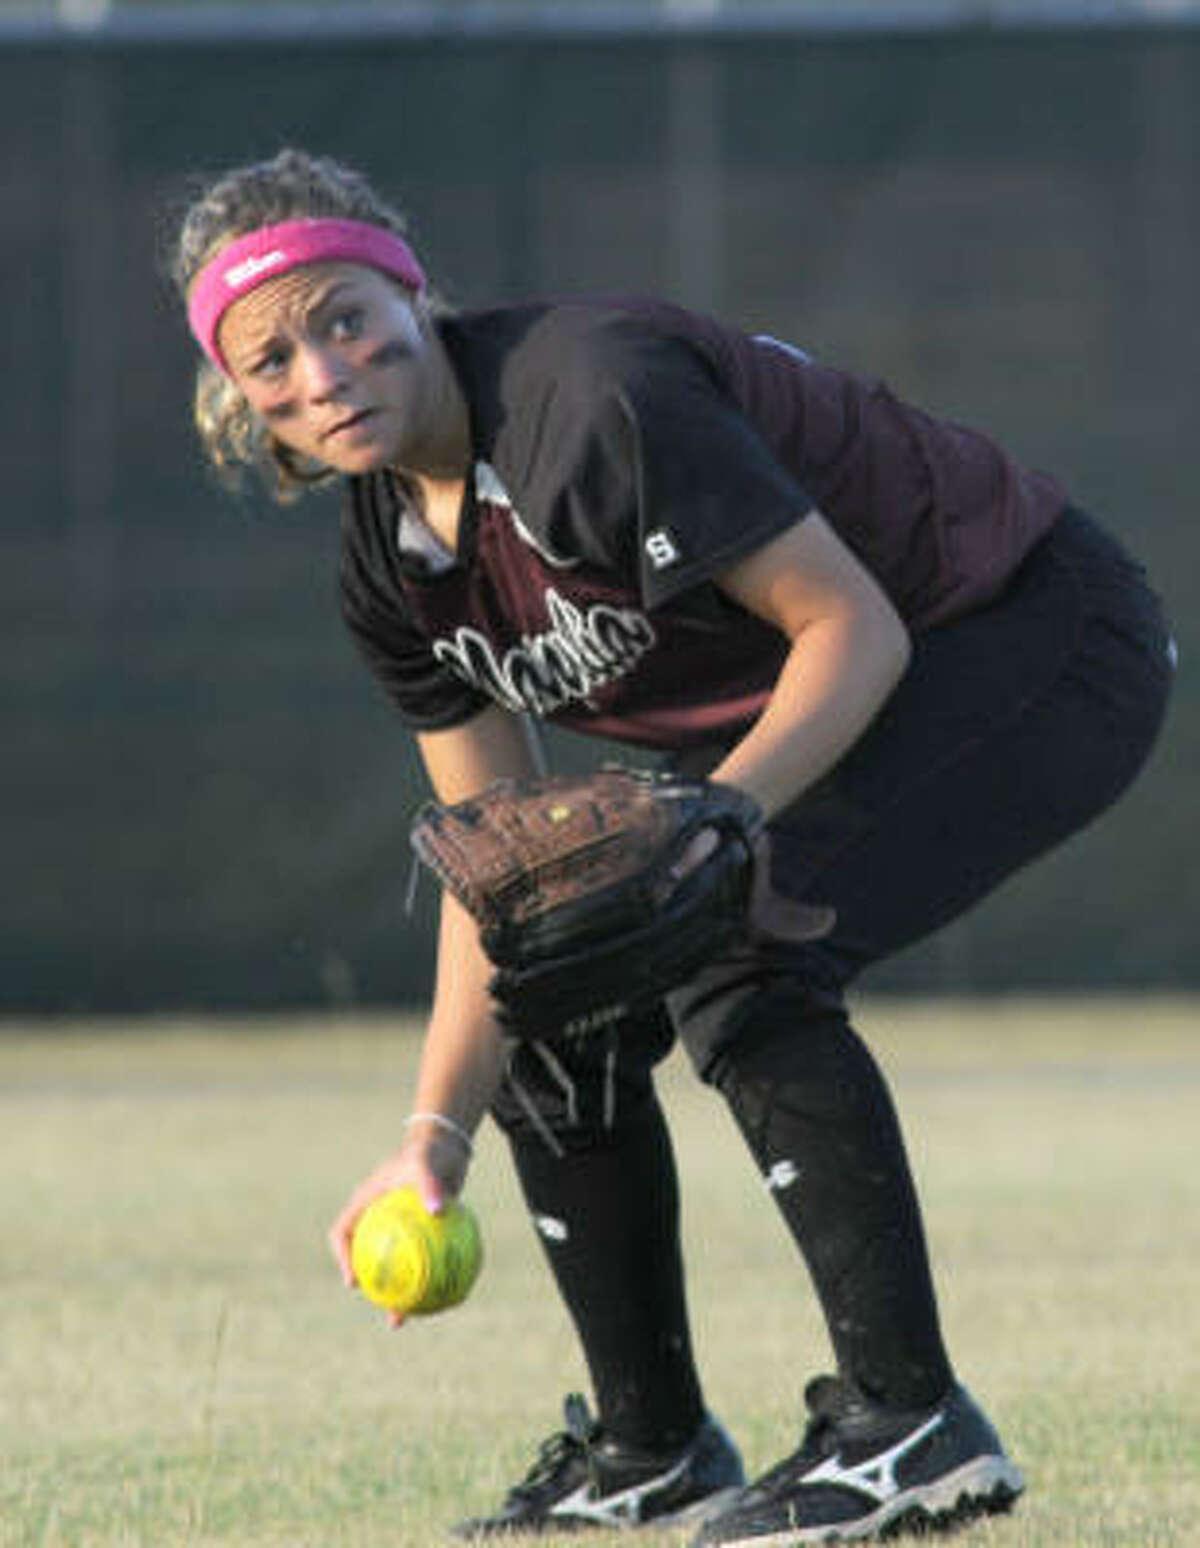 Magnolia senior centerfielder Tara Kelehan picks up the hit that scored Waltrip's lone run.